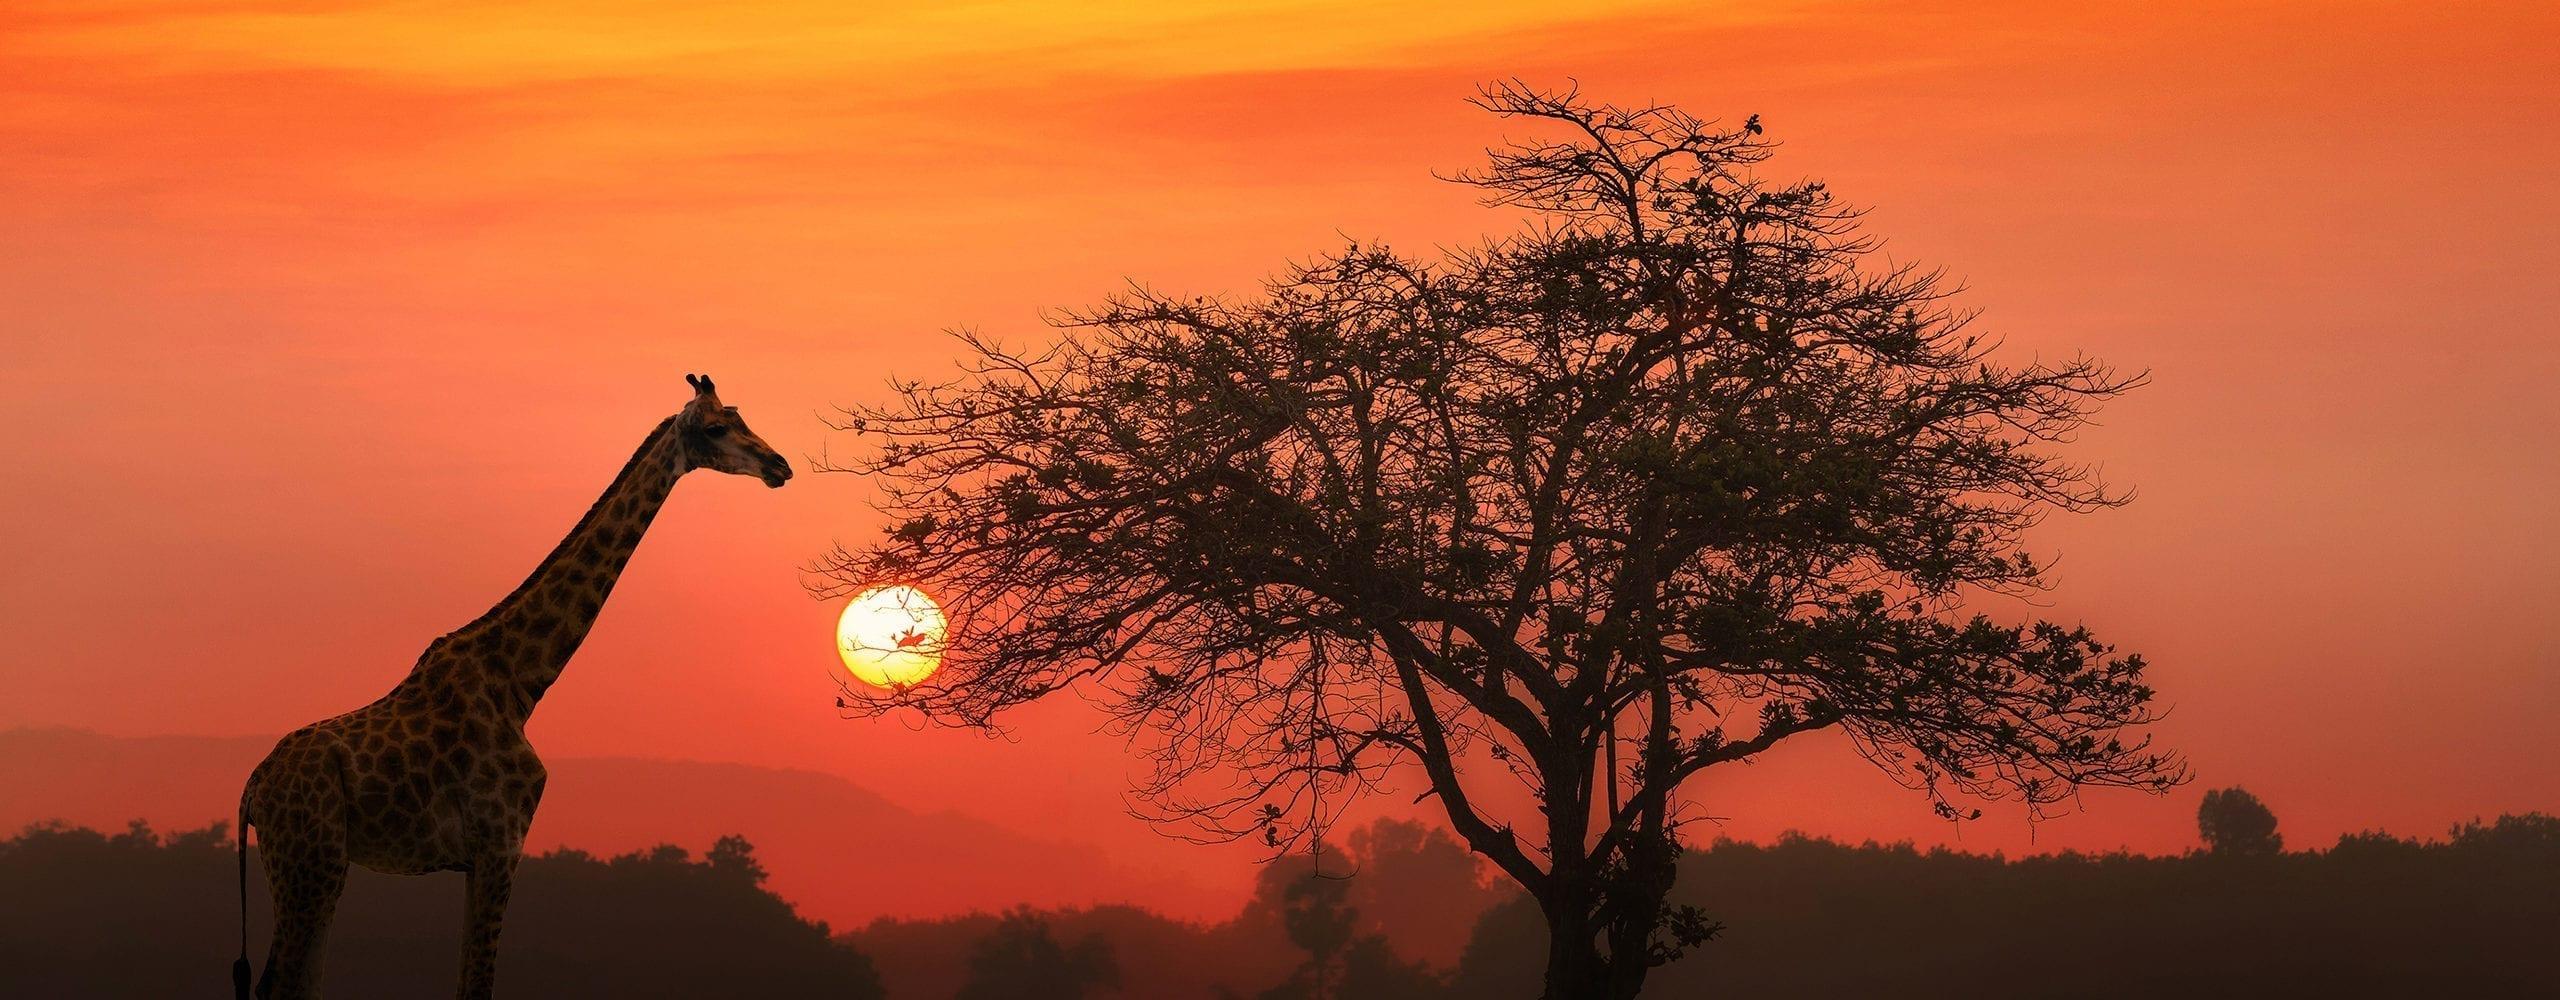 About Wildlife Safari. © iStock